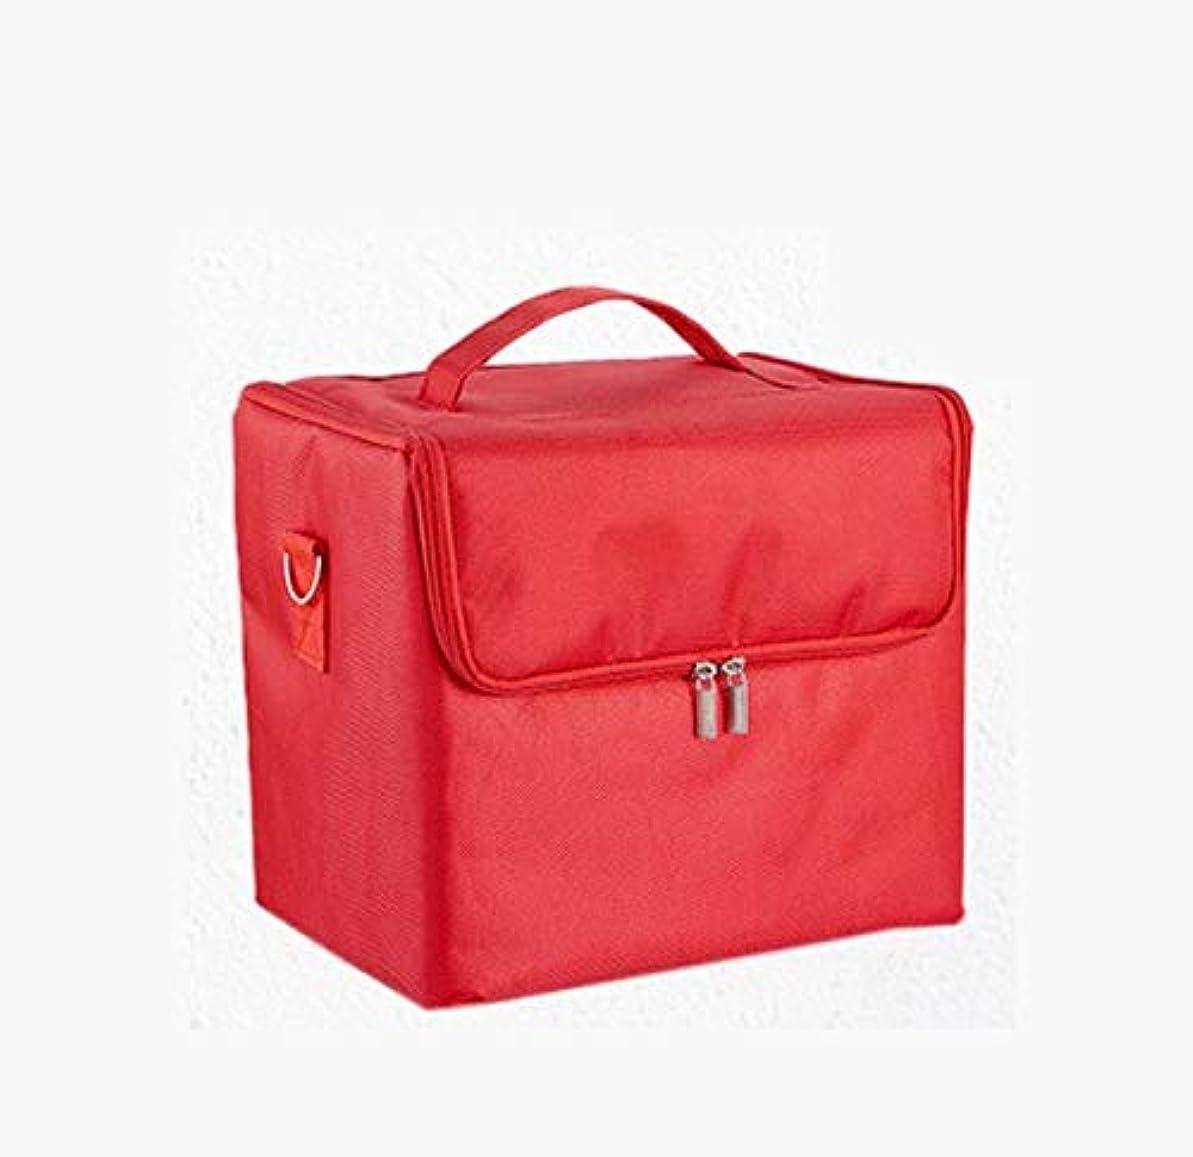 化粧箱、大容量多機能防水化粧品ケース、携帯用旅行化粧品袋収納袋、美容化粧ネイルジュエリー収納箱 (Color : Red)